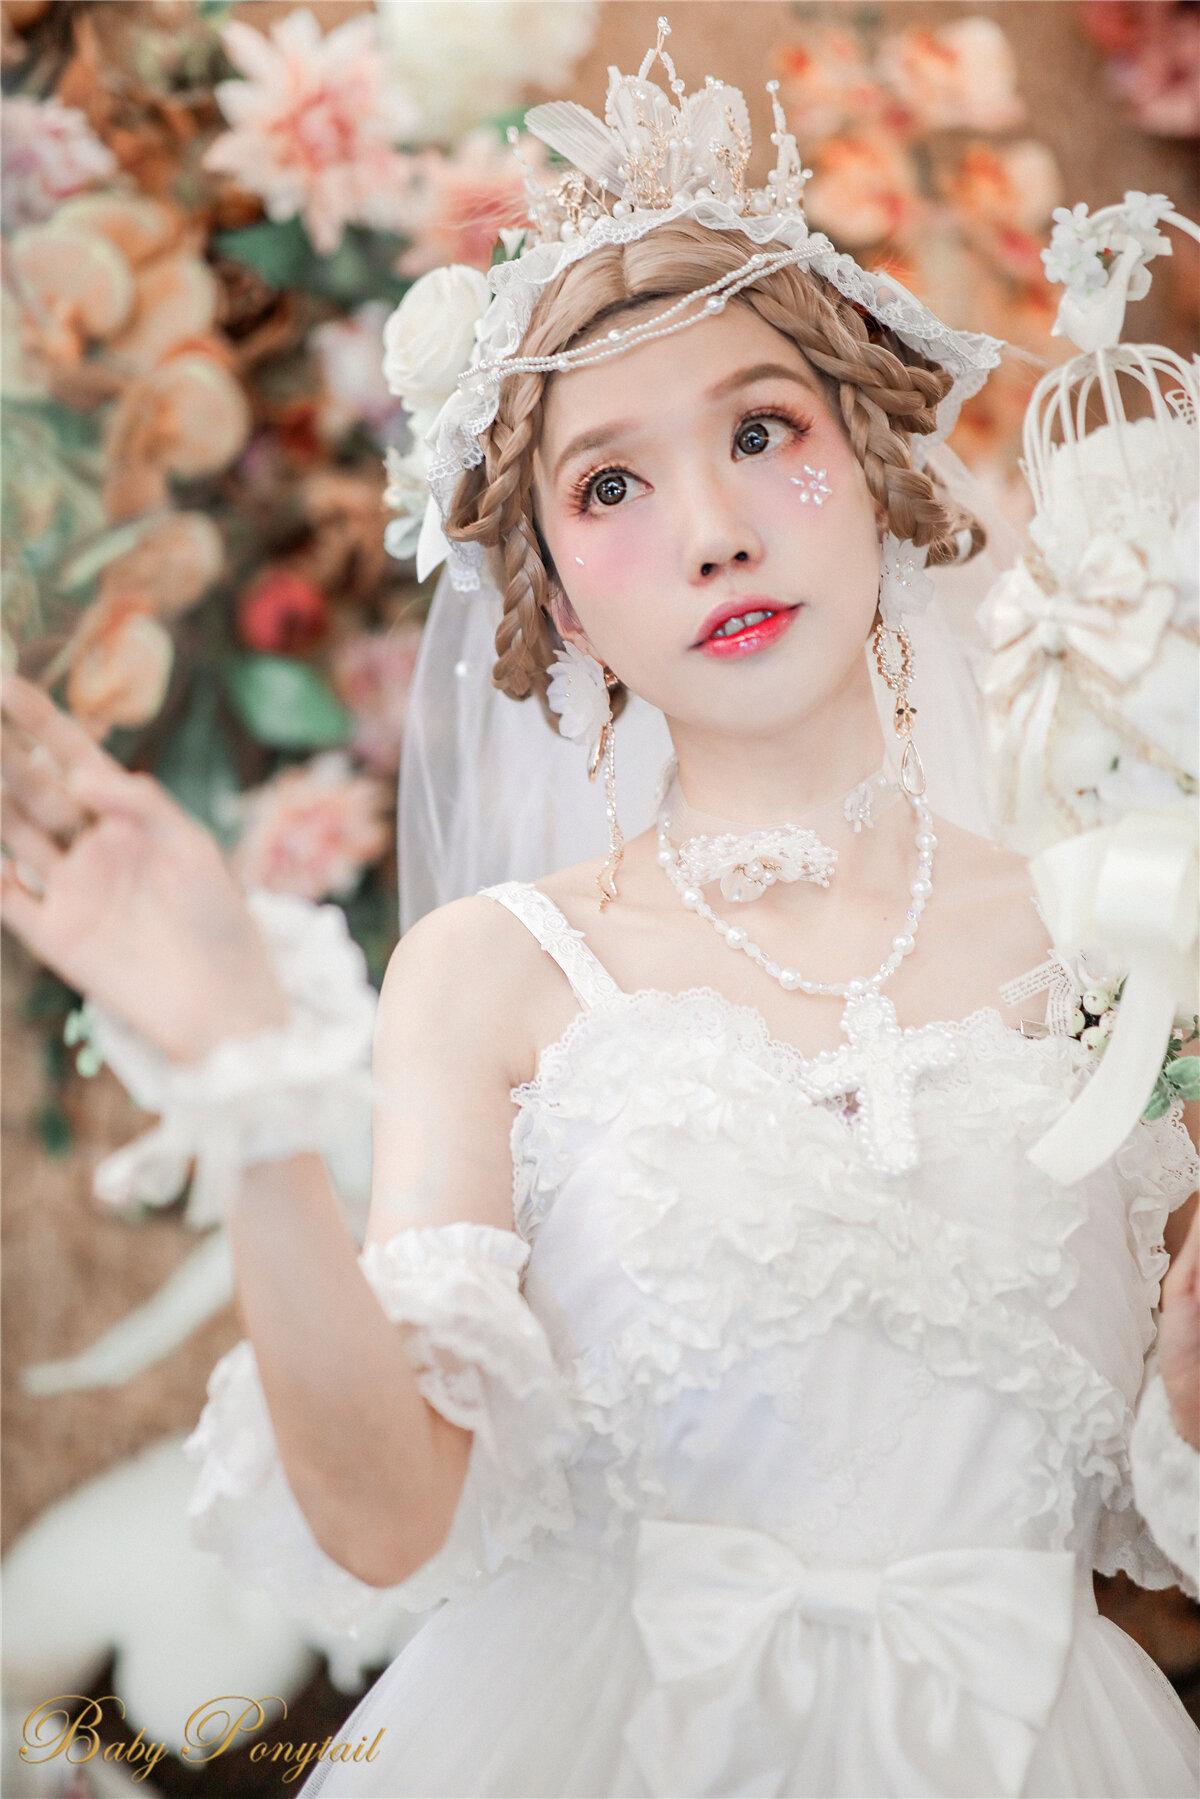 Babyponytail_Heavenly Teardrops_Model photo_JSK white_kaka_26.jpg